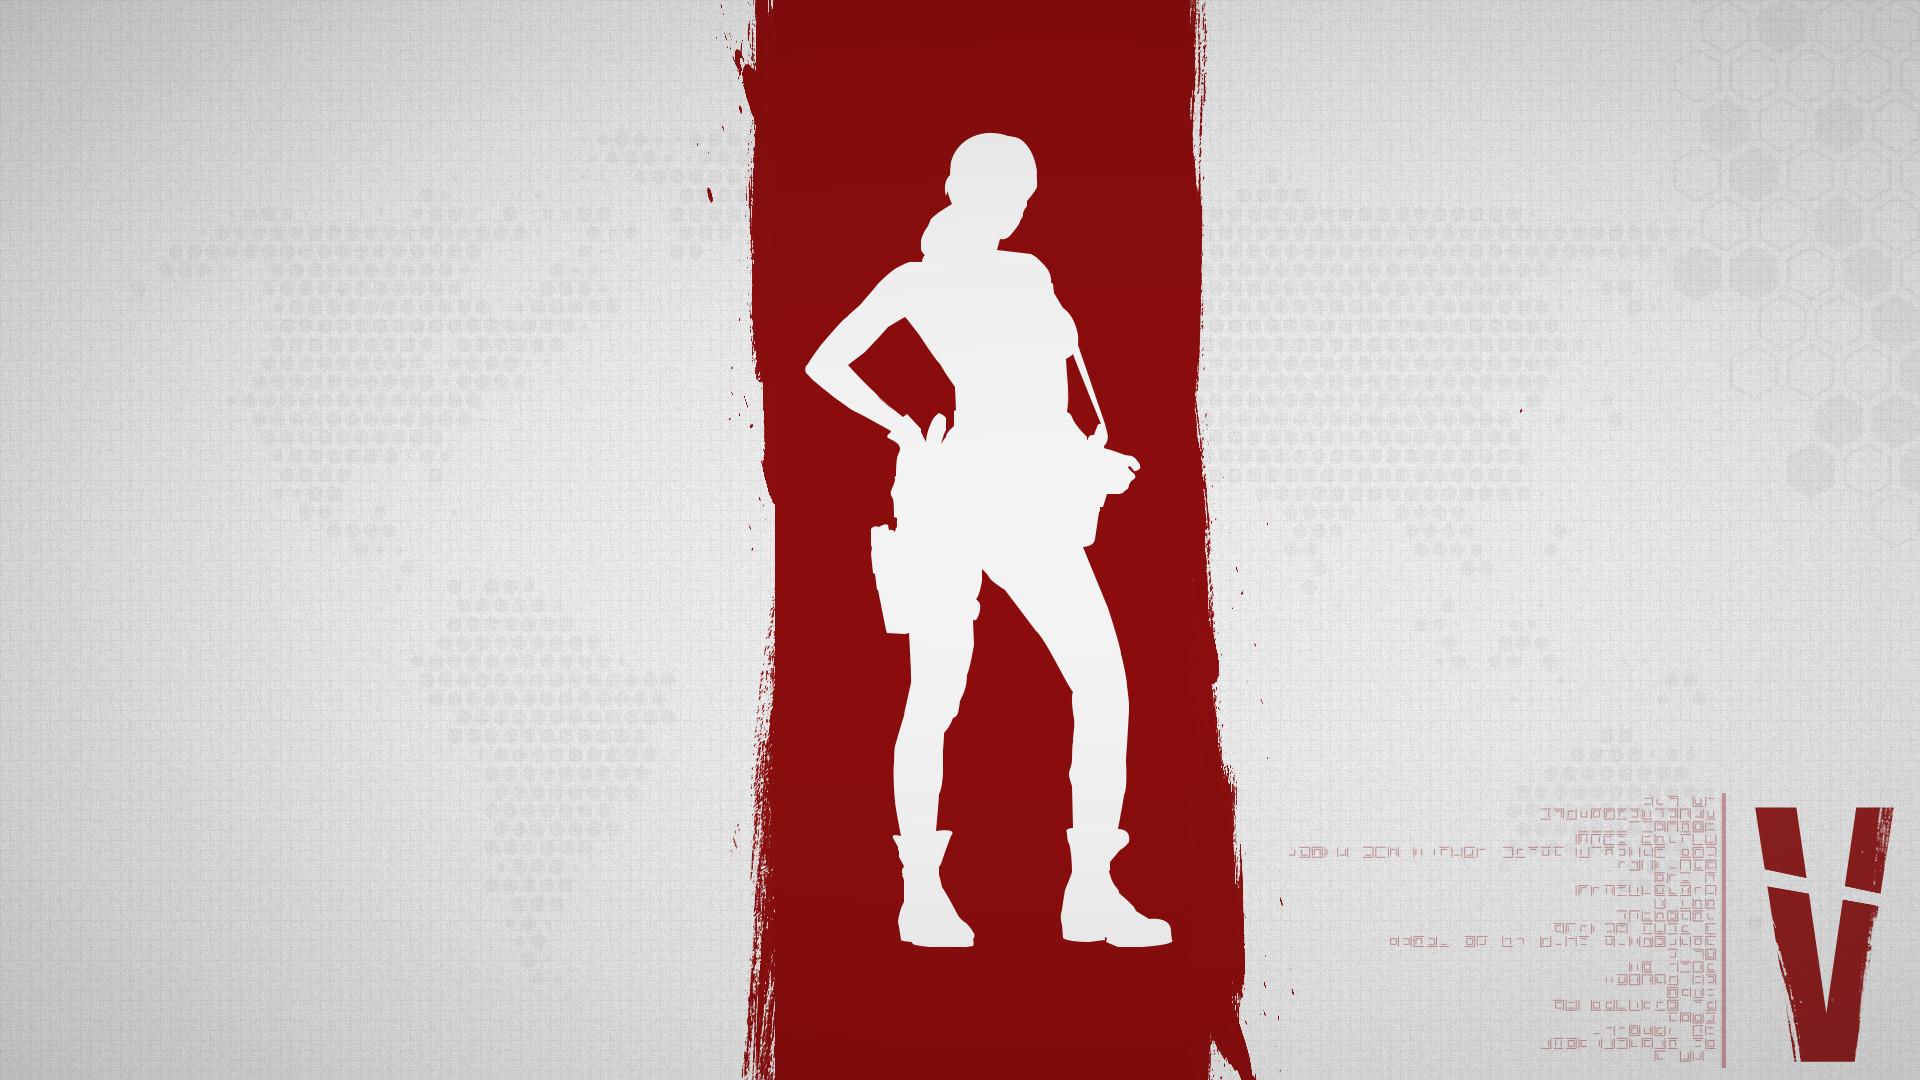 Metal Gear Solid 5 Quiet Wallpaper White